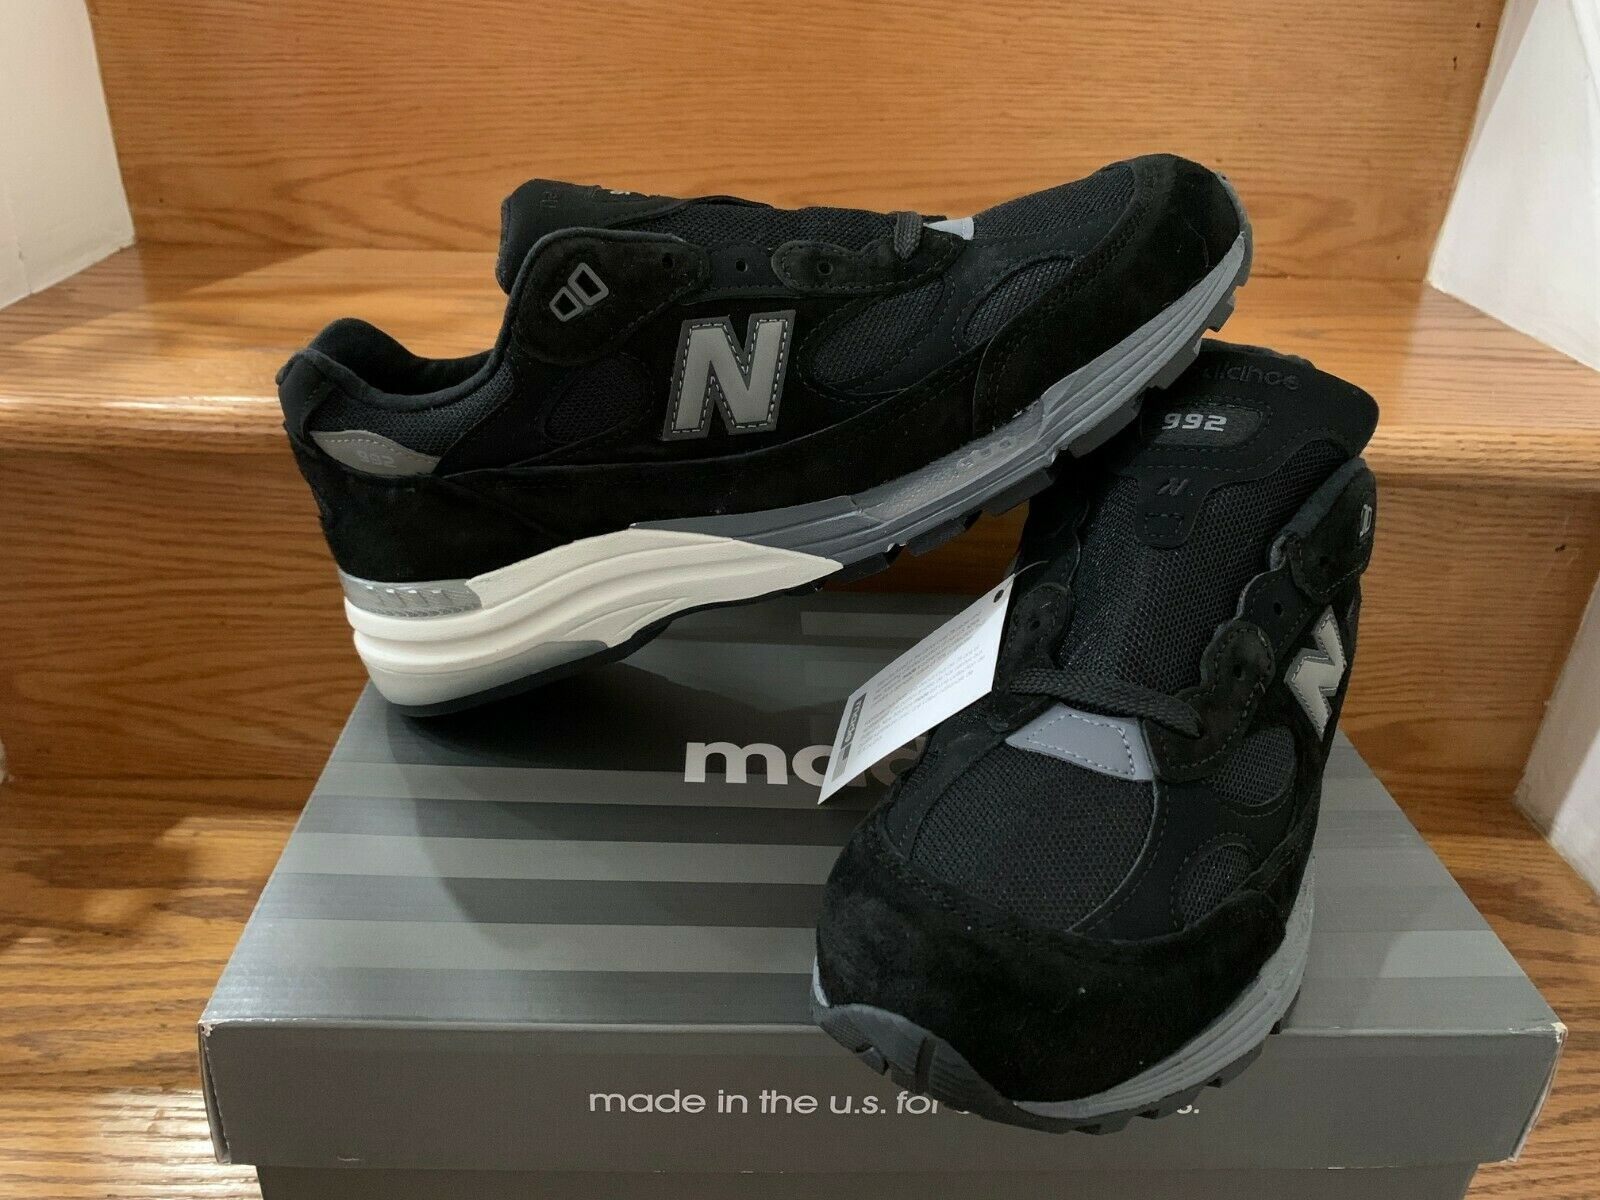 New Balance 992 Black Grey Made in USA